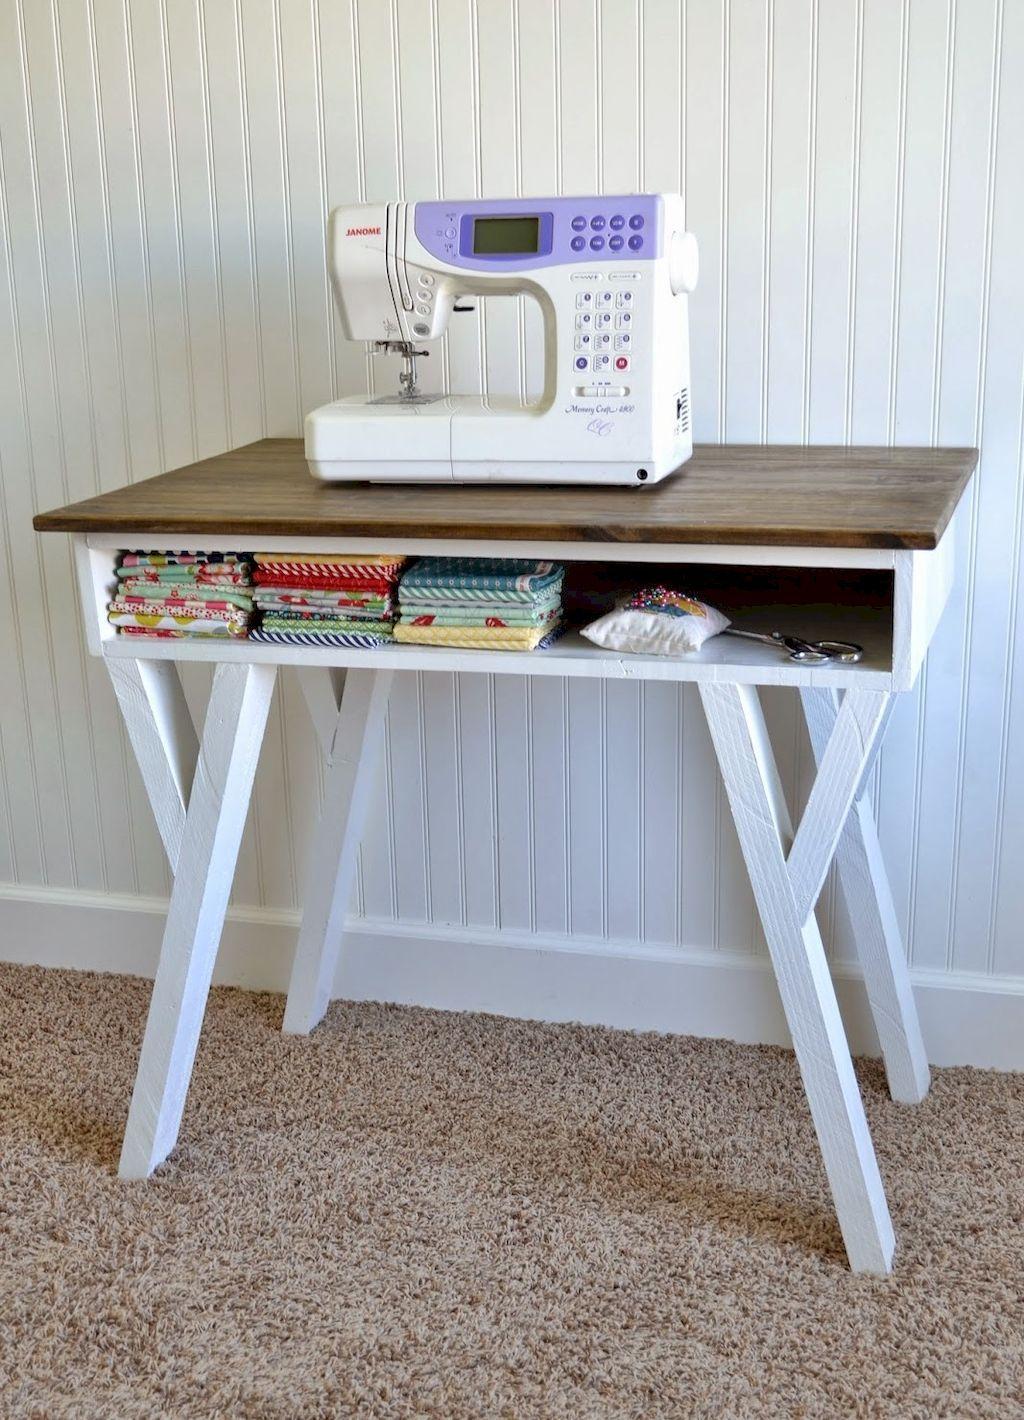 Cool 40 Easy DIY Farmhouse Desk Decor Ideas On A Budget  Https://roomadness.com/2017/11/25/40 Easy Diy Farmhouse Desk Decor  Ideas Budget/